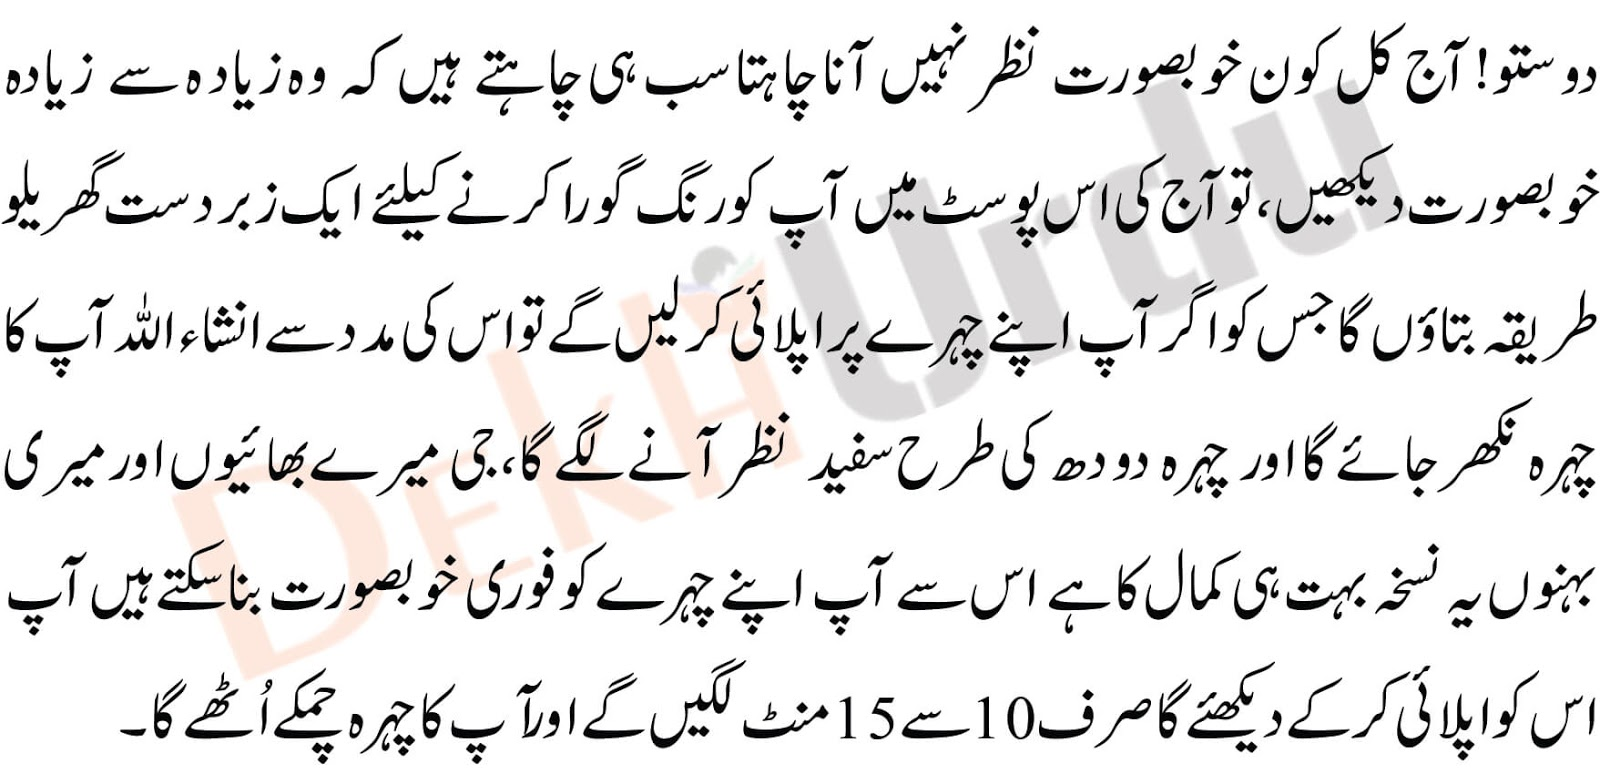 Beauty Tips In Urdu For Face Whitening Naturally At Home - Dekh Urdu